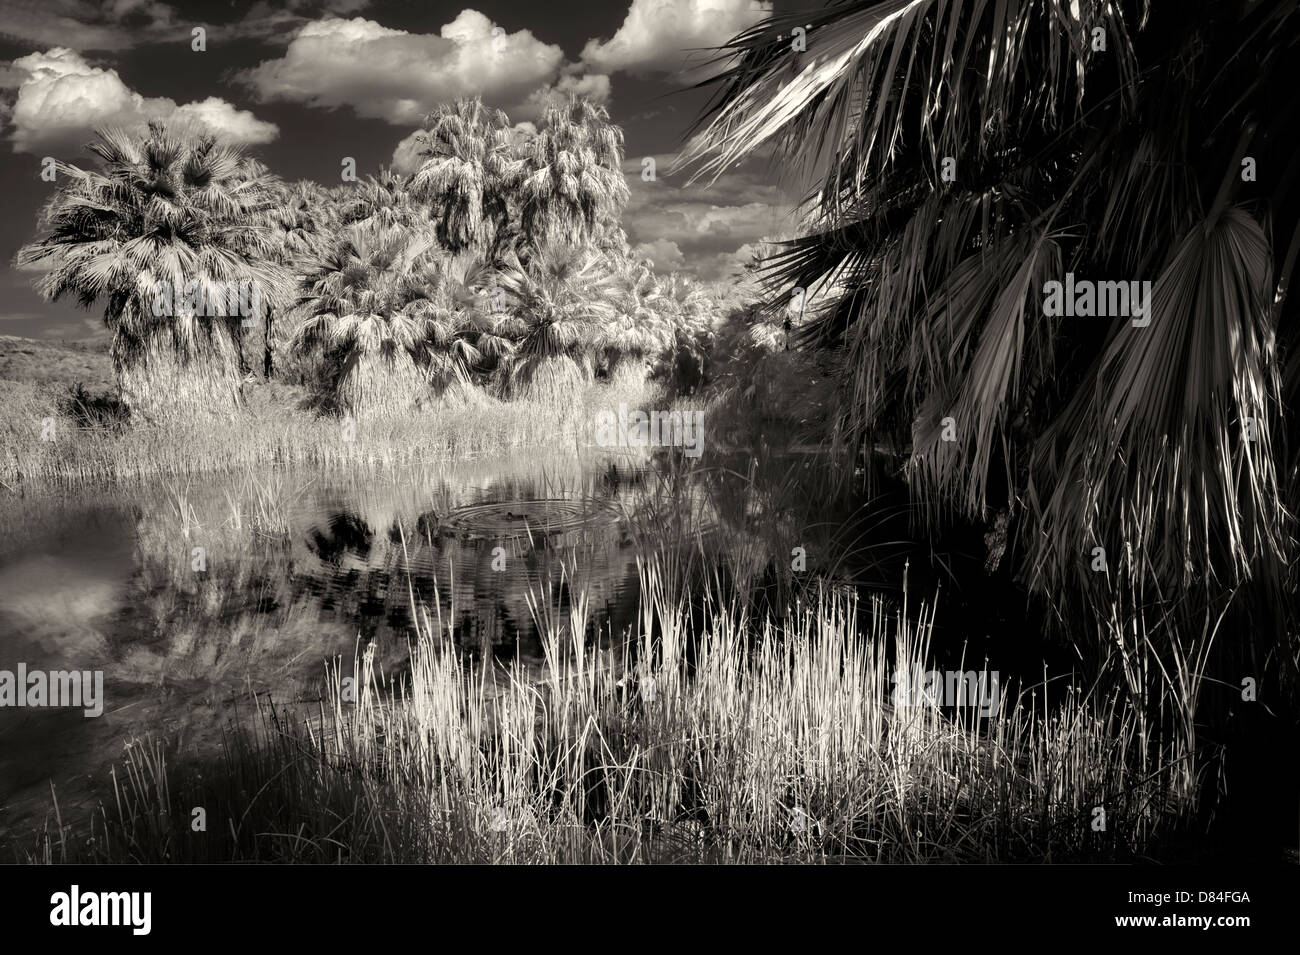 McCallum Pond. Coachella Valley Preserve. California - Stock Image